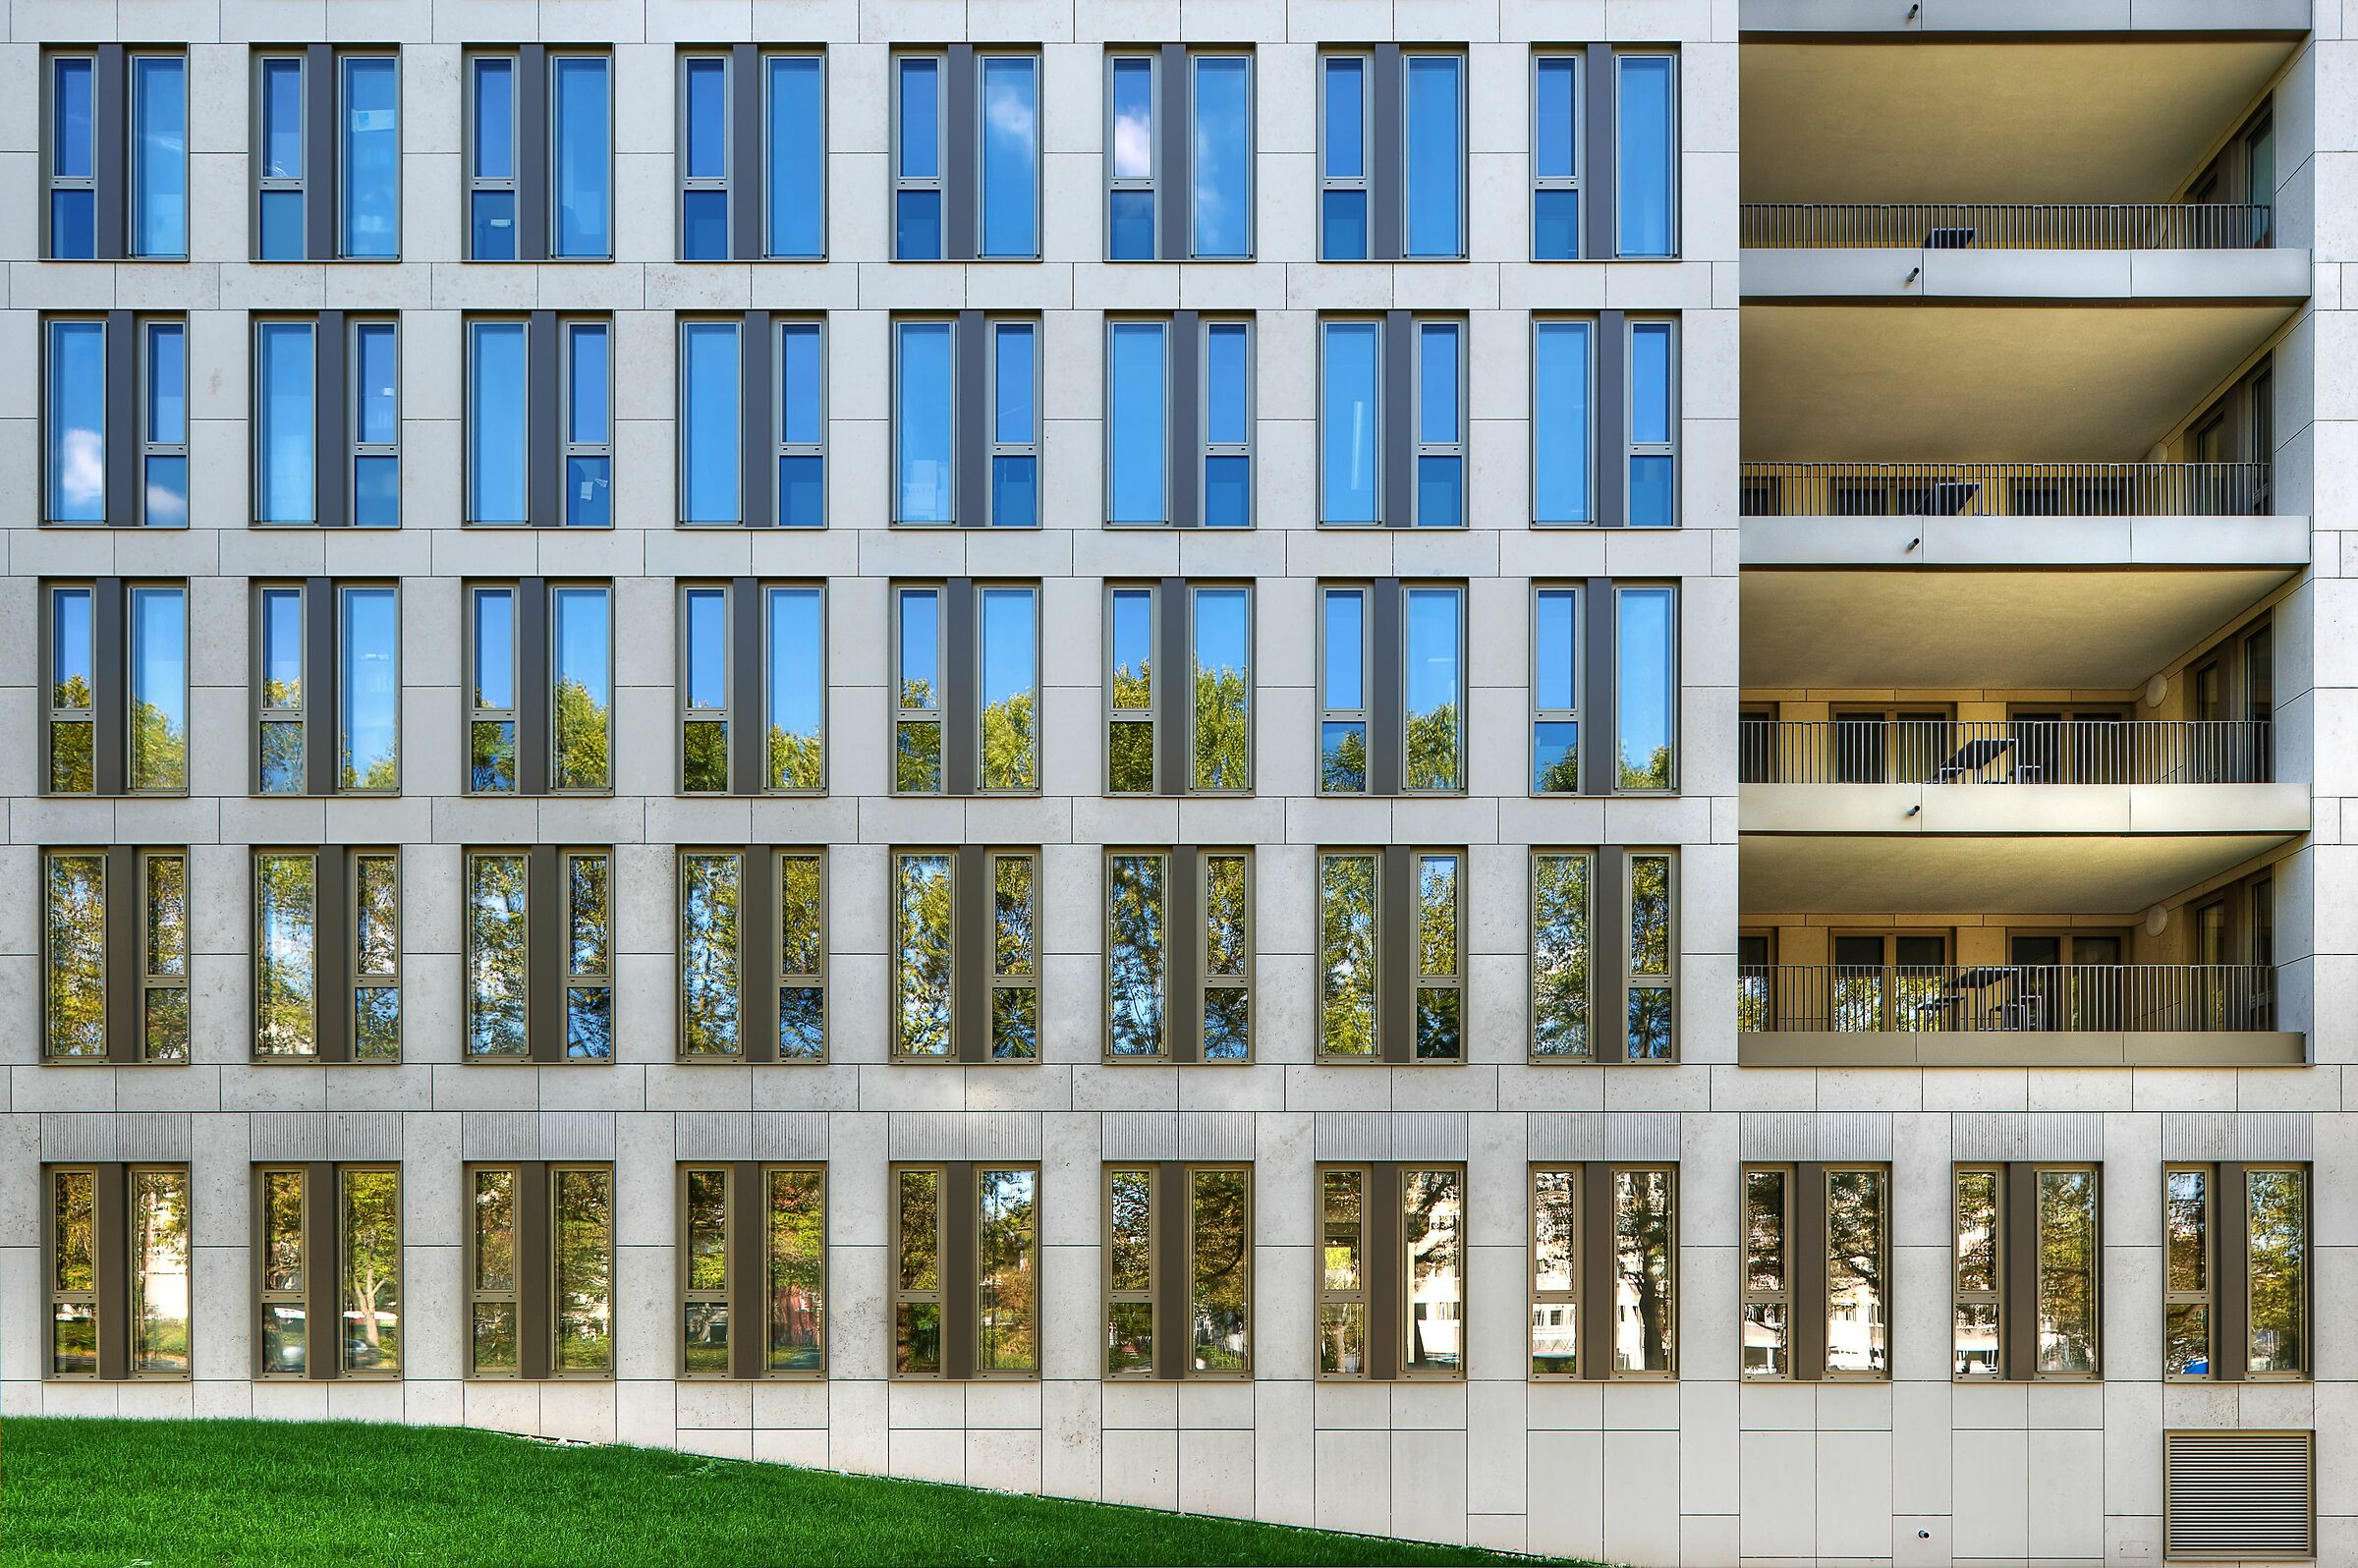 Office Building, Wiesbaden, Germany...